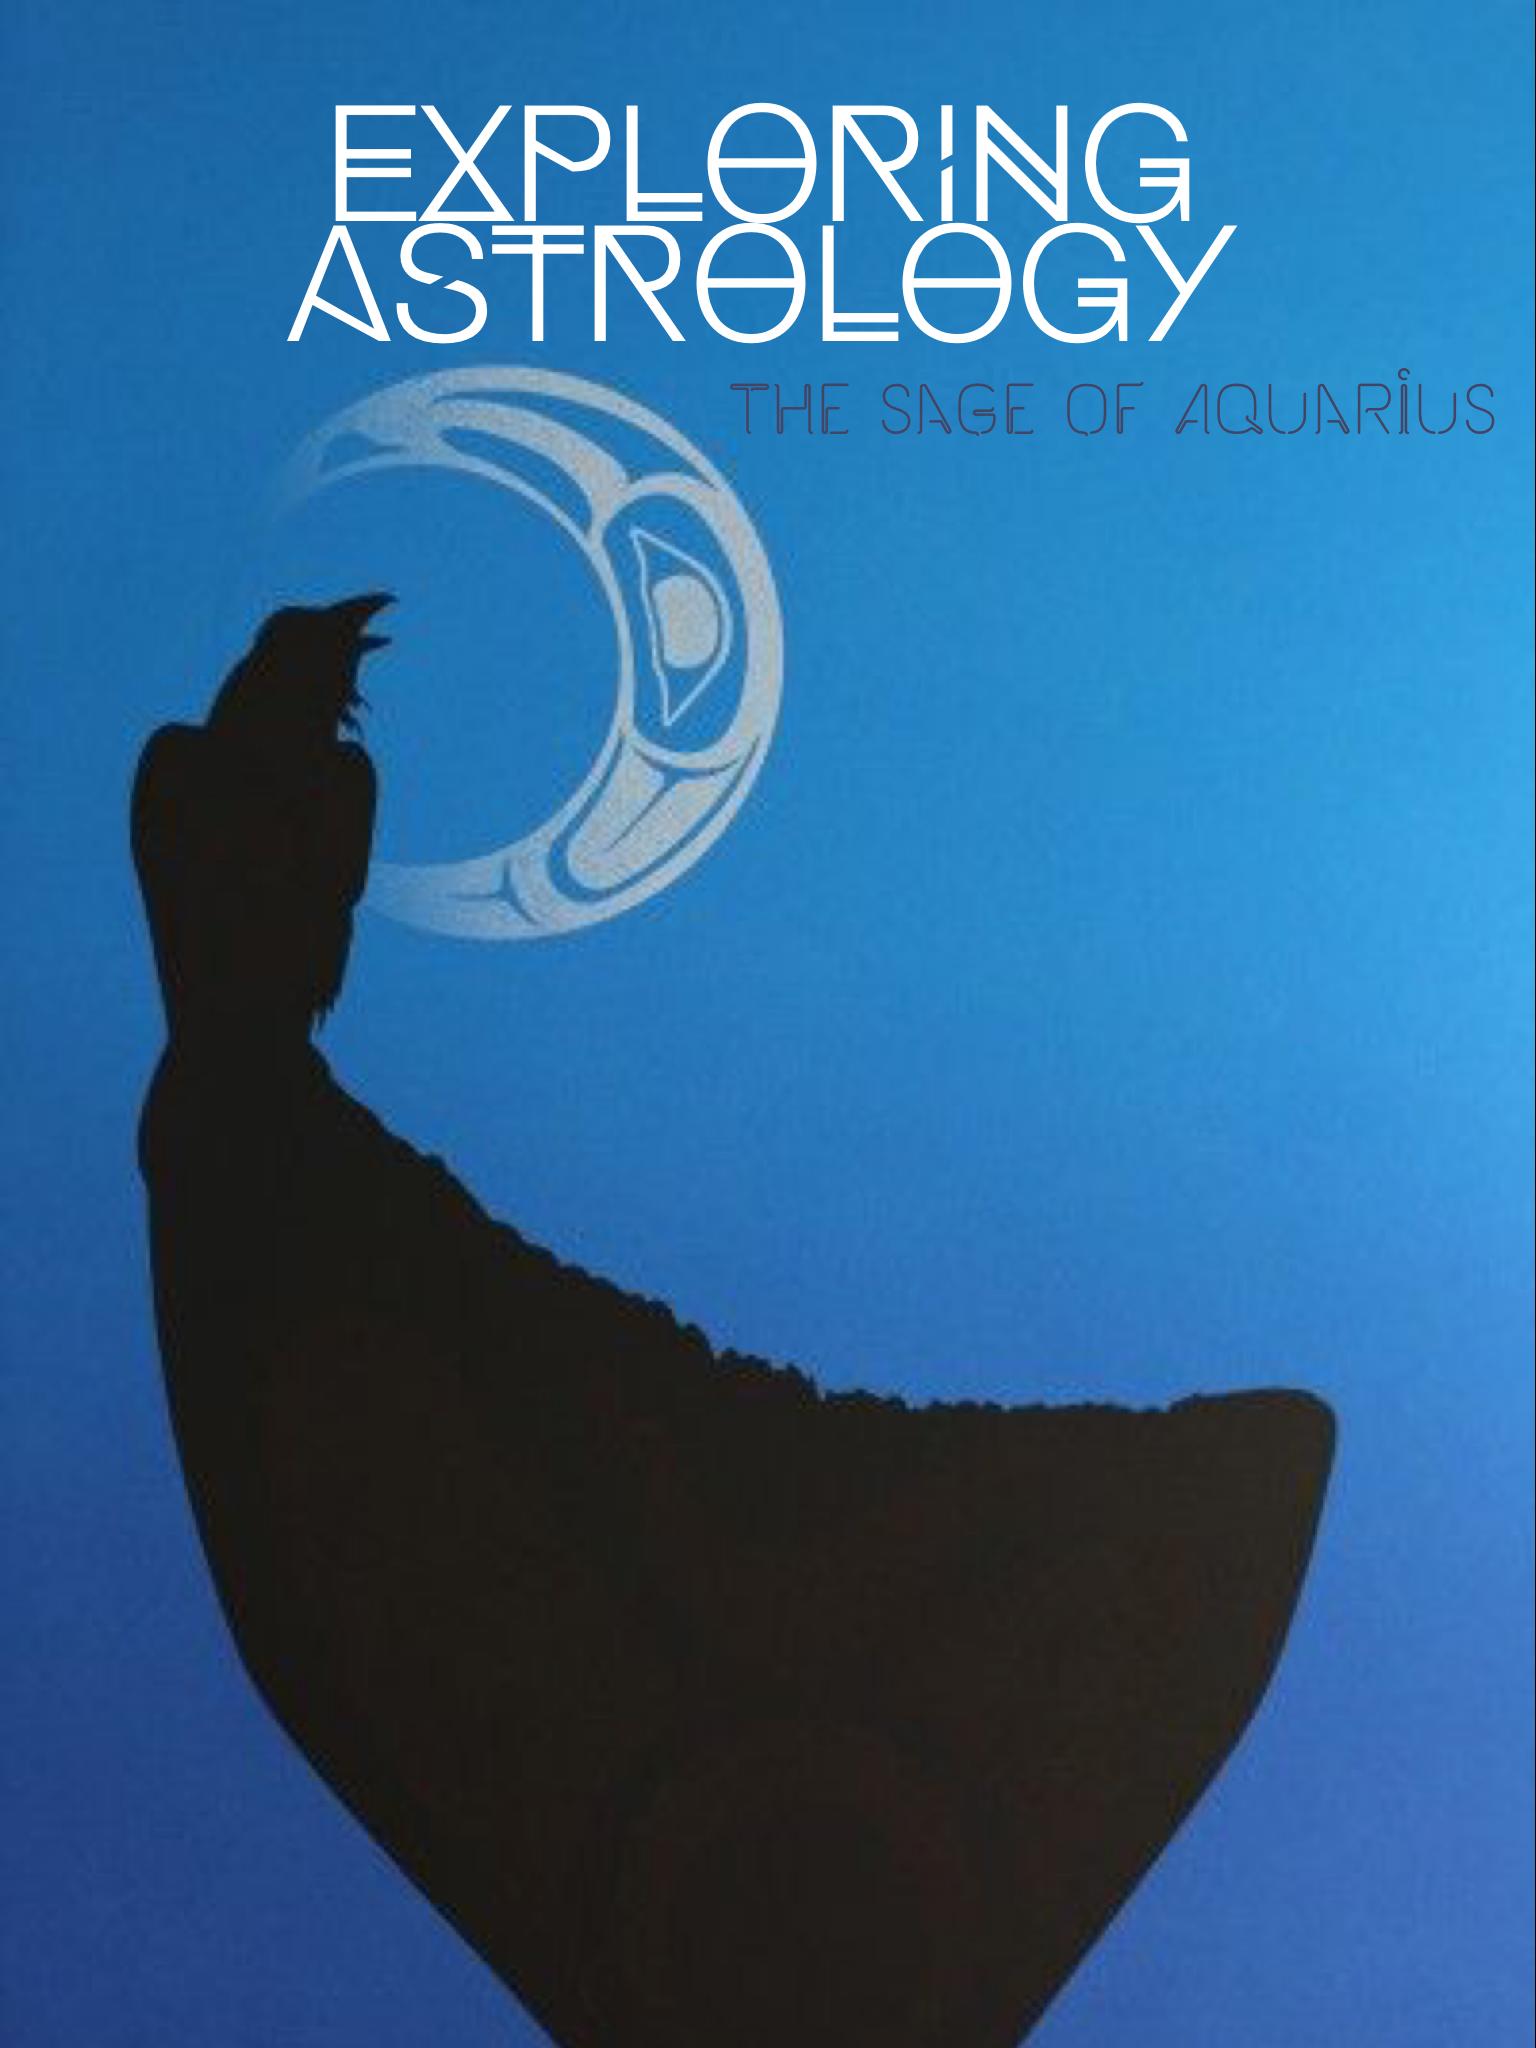 Exploring Astrology: The Sage of Aquarius